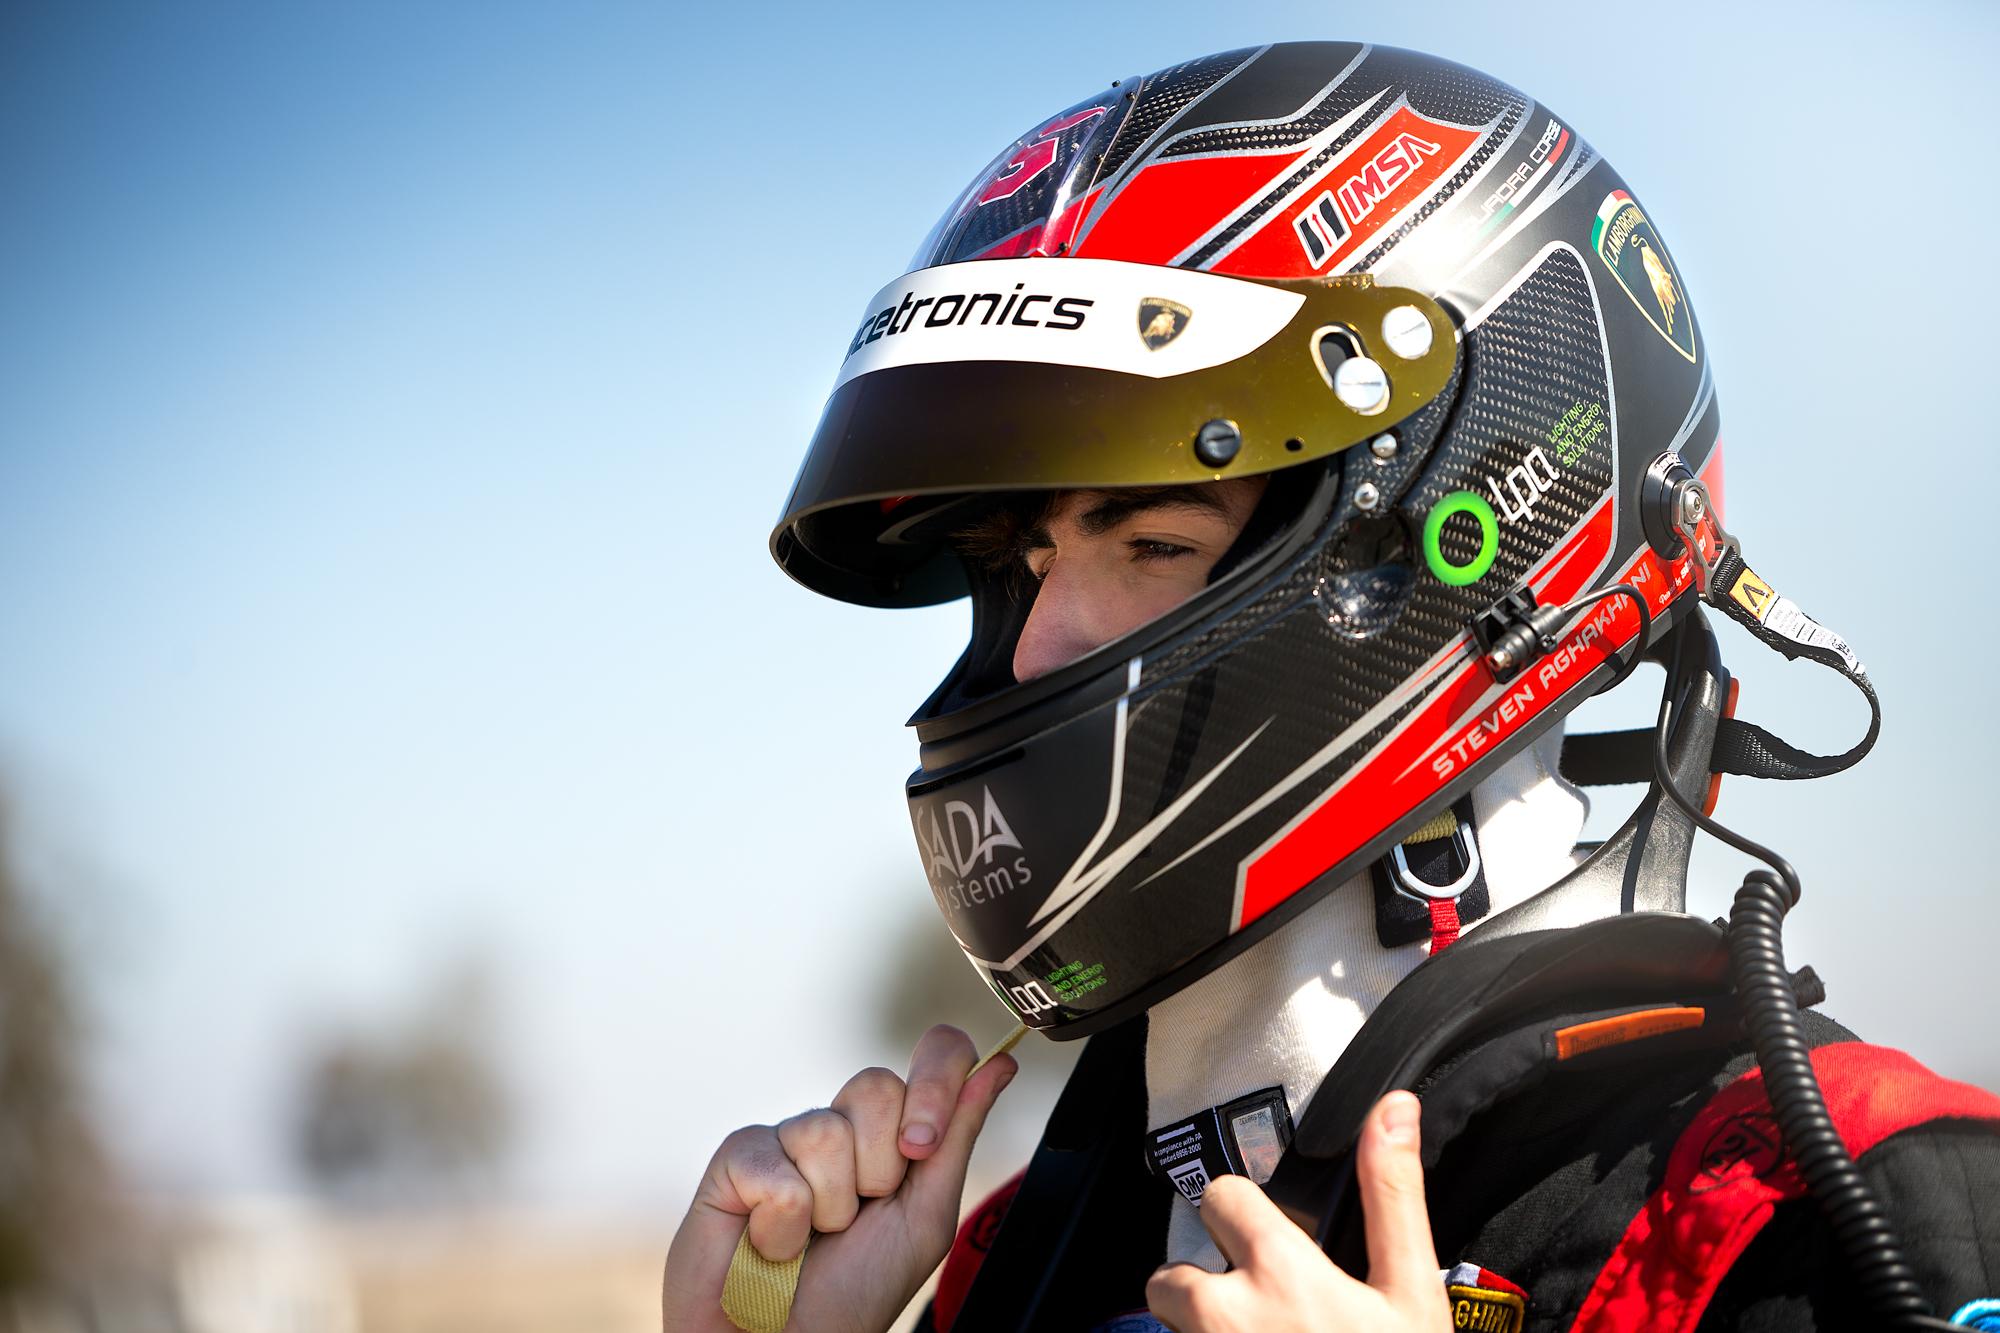 Steven-Racing-20180221-73411.jpg